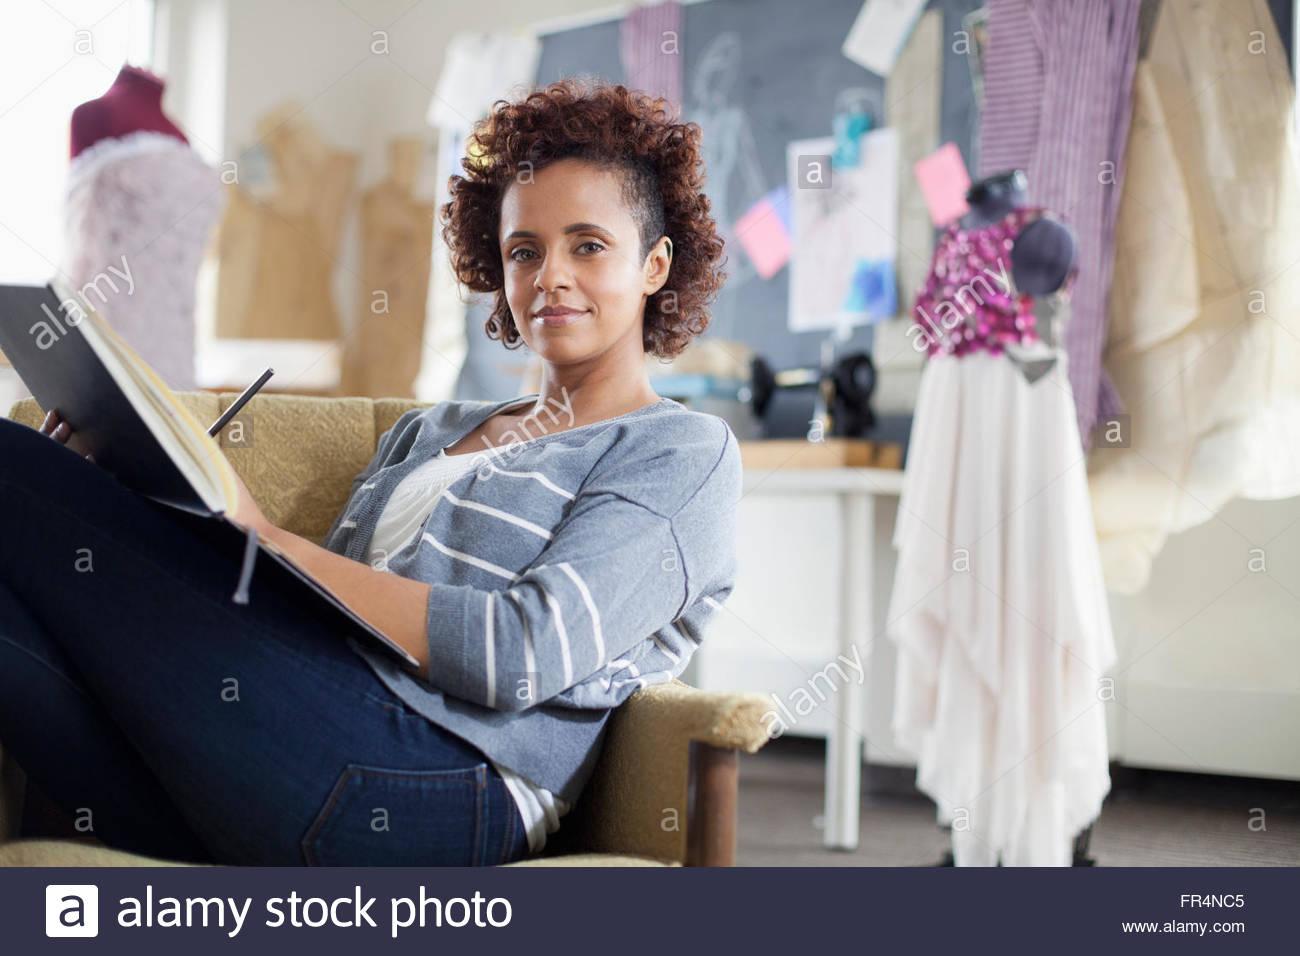 portrait of fashion designer reviewing sketchbook in studio - Stock Image